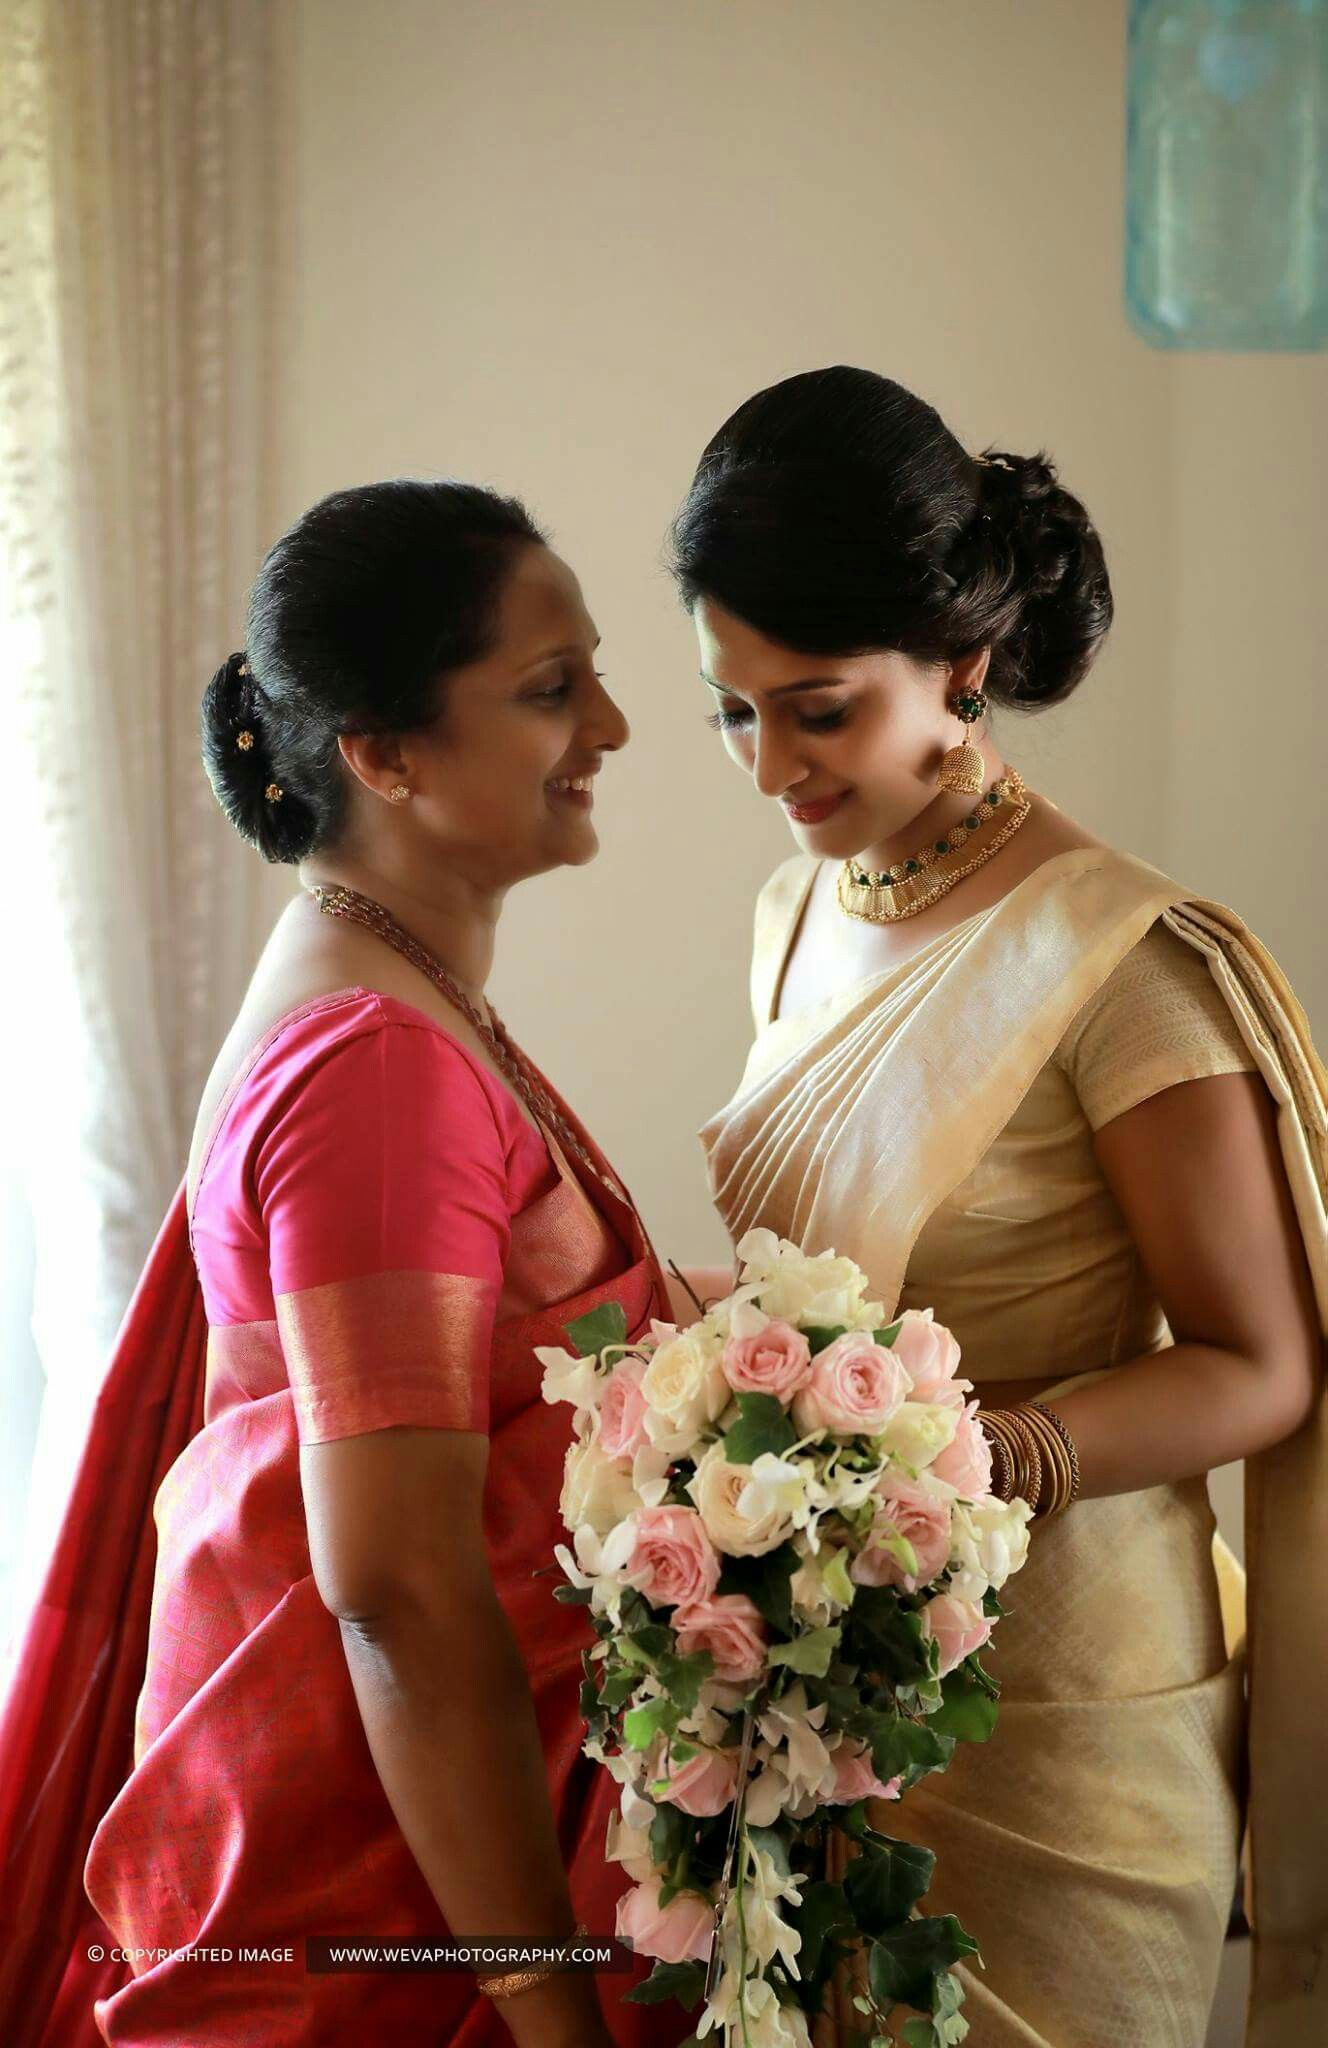 Kerala wedding reception dresses for the bride  shephy john shephyjohn on Pinterest